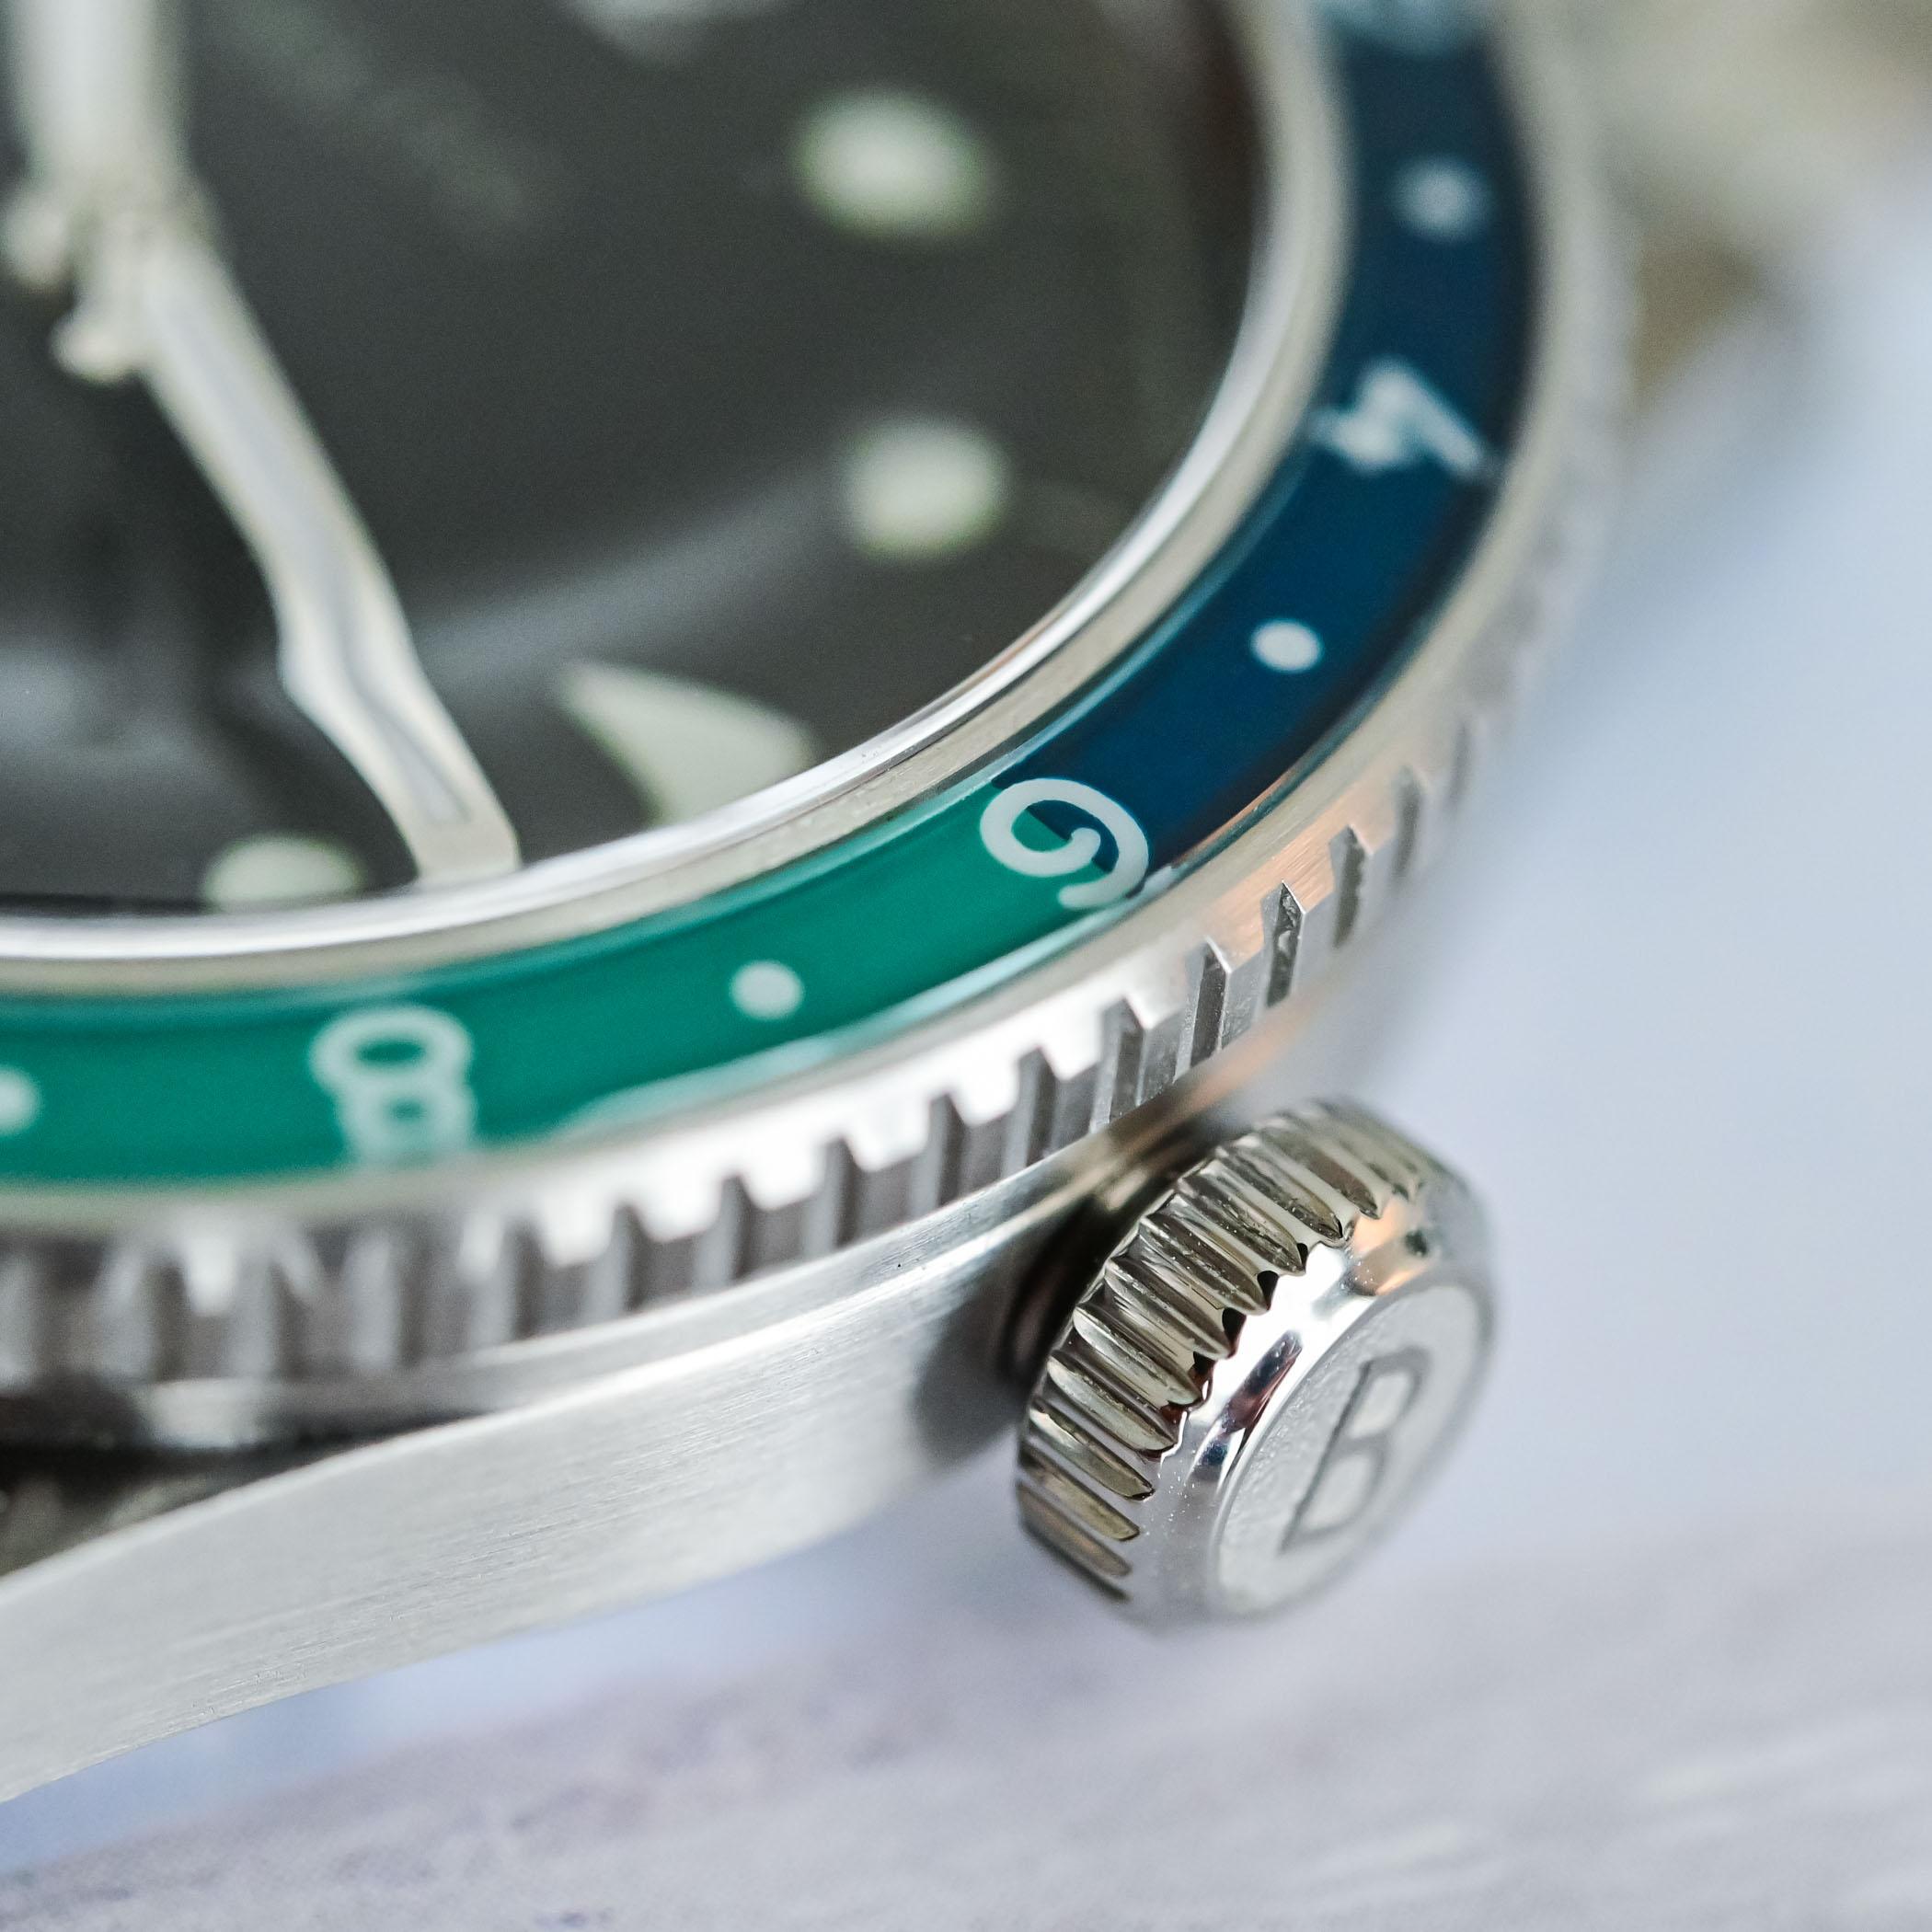 Baltic Aquascaphe GMT - Review - 9